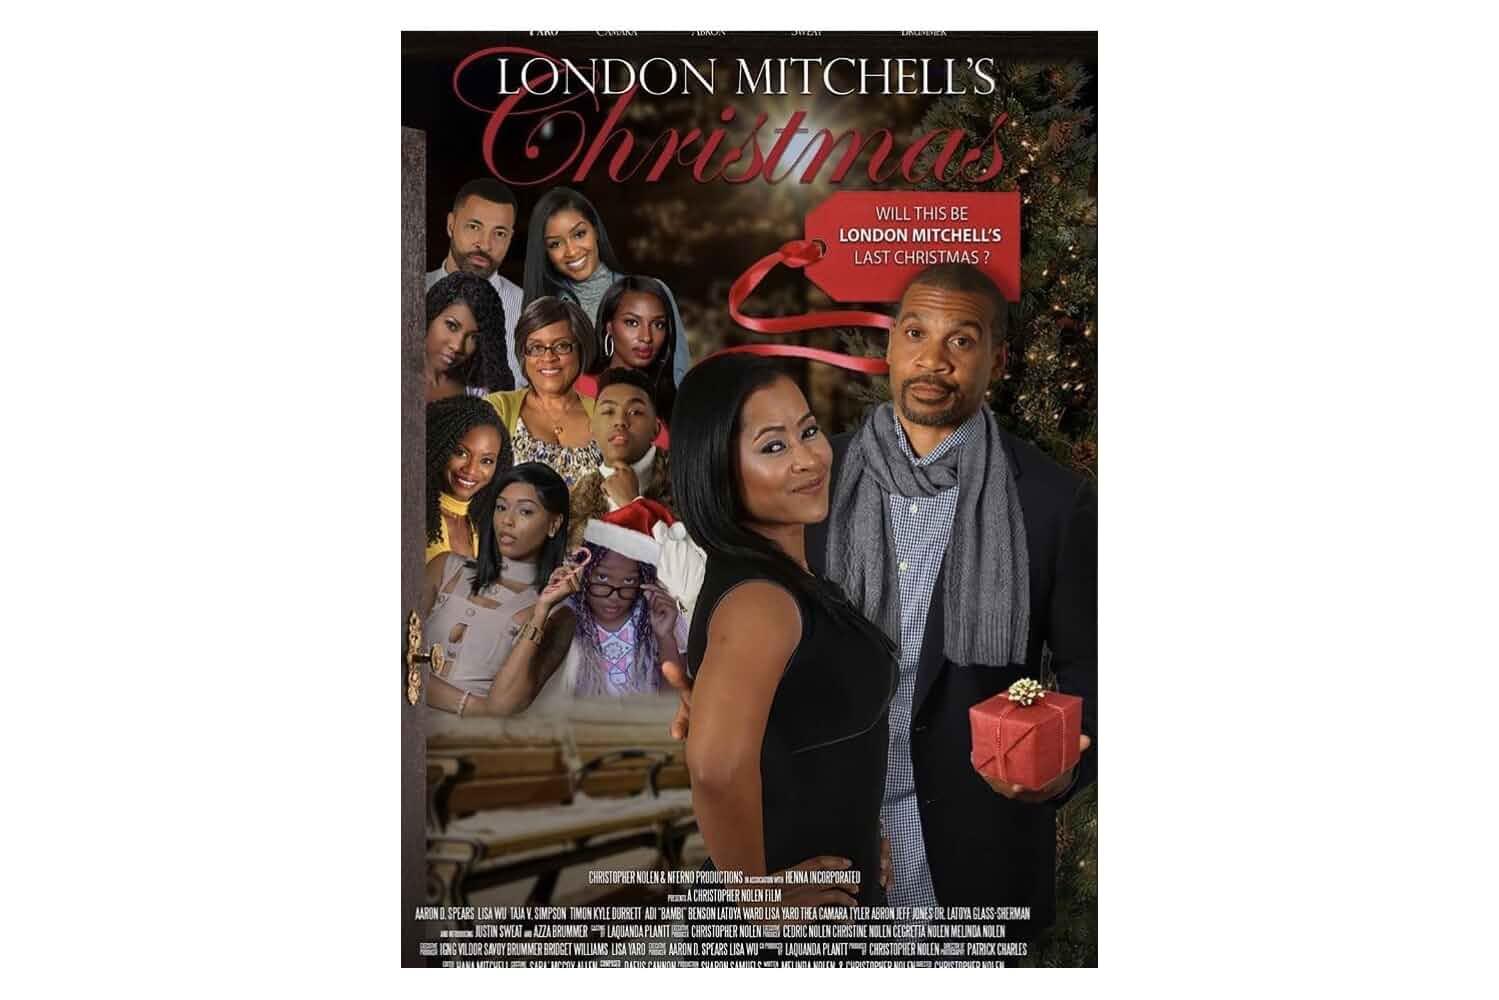 London Mitchell's Christmas (2018)